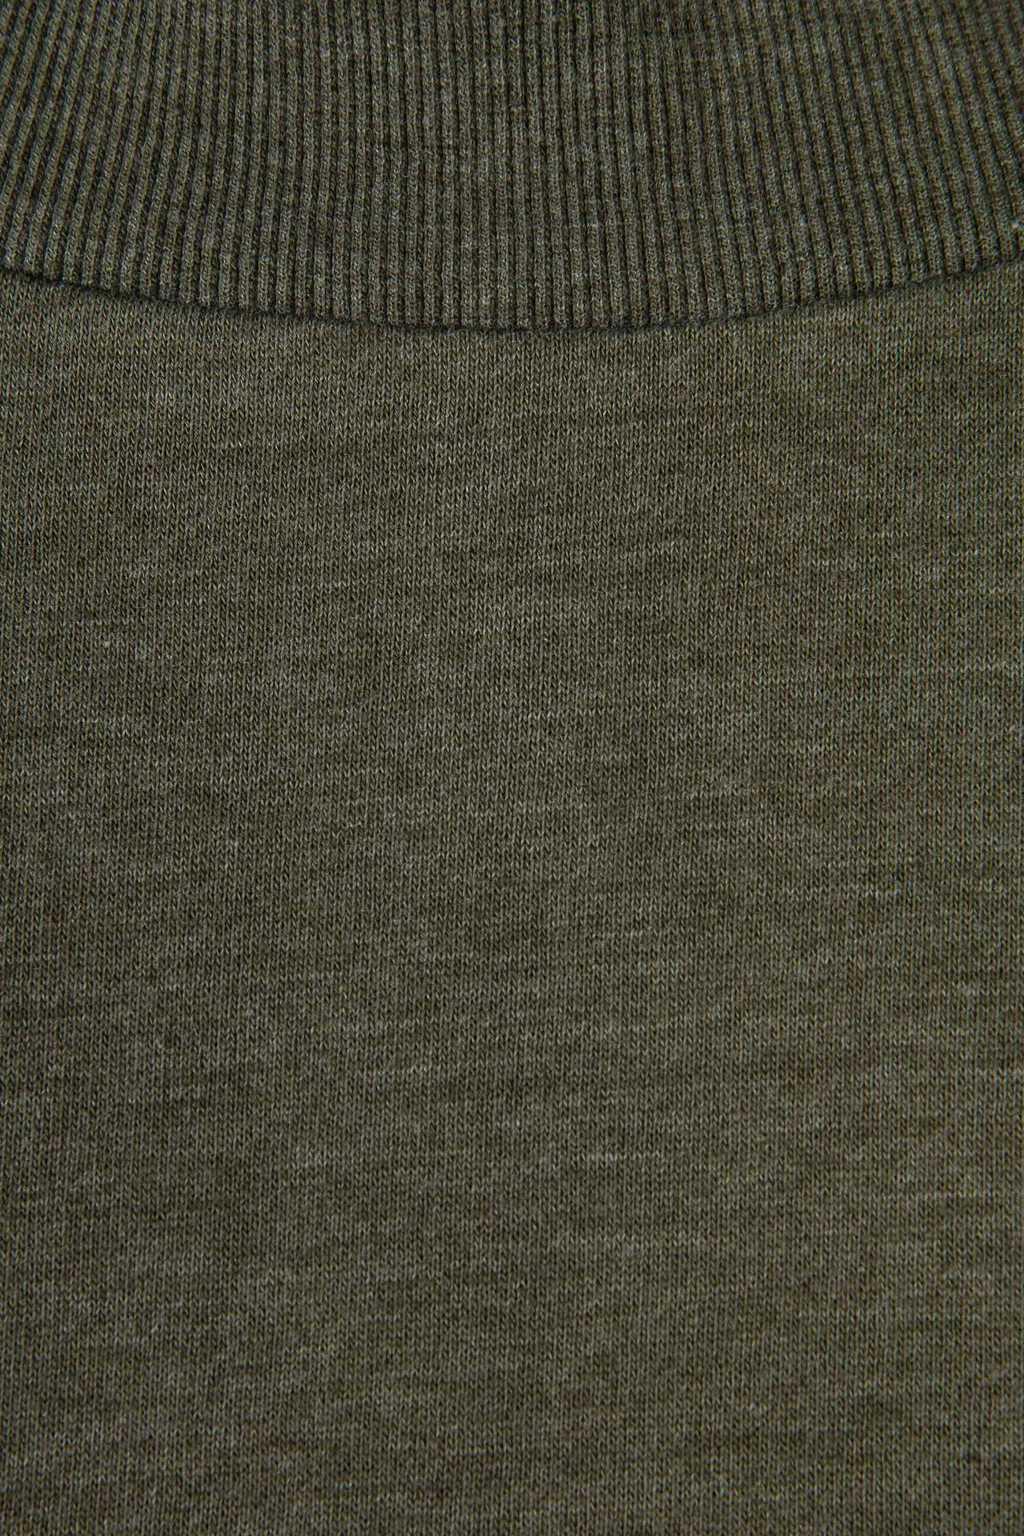 Sweatshirt 2886 Olive 8